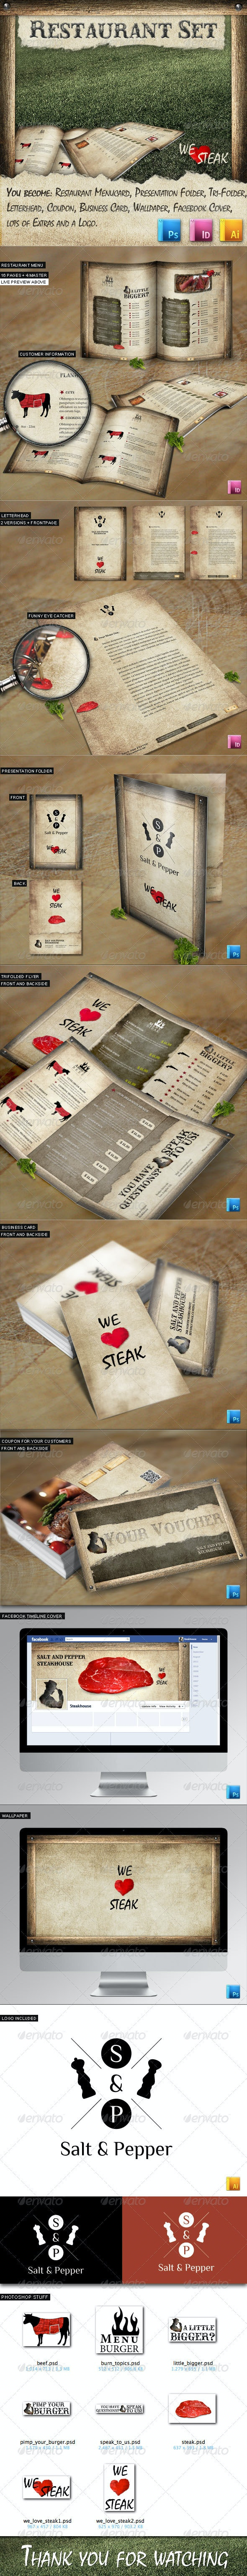 Rustic BBQ Steak House Restaurant Set - Stationery Print Templates